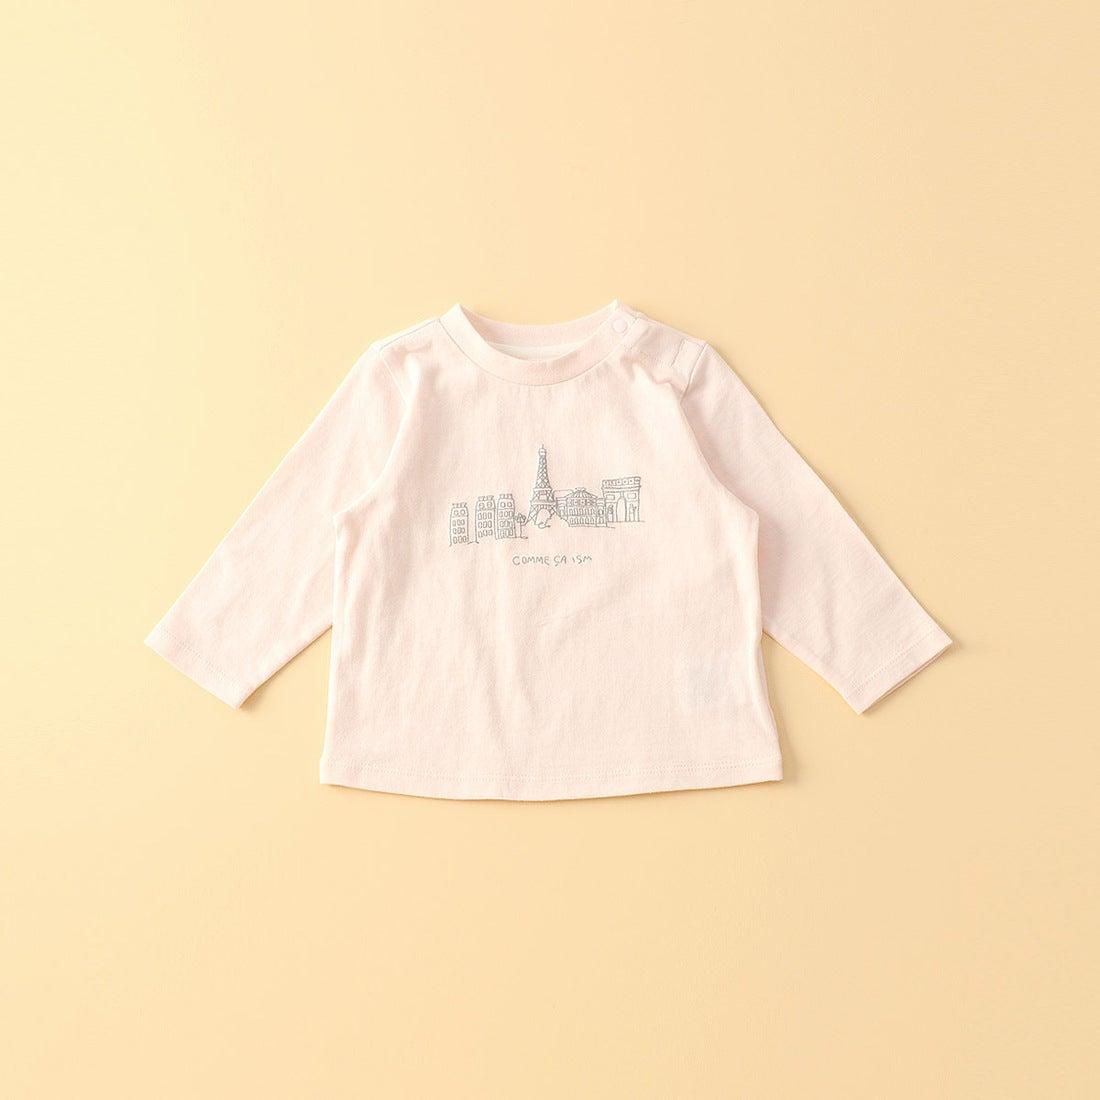 85fa17518f9cc コムサイズム COMME CA ISM  キッズ・ベビーおそろいアイテム  刺繍風プリント 長袖Tシャツ (ピンク) -靴&ファッション通販  ロコンド〜自宅で試着、気軽に返品